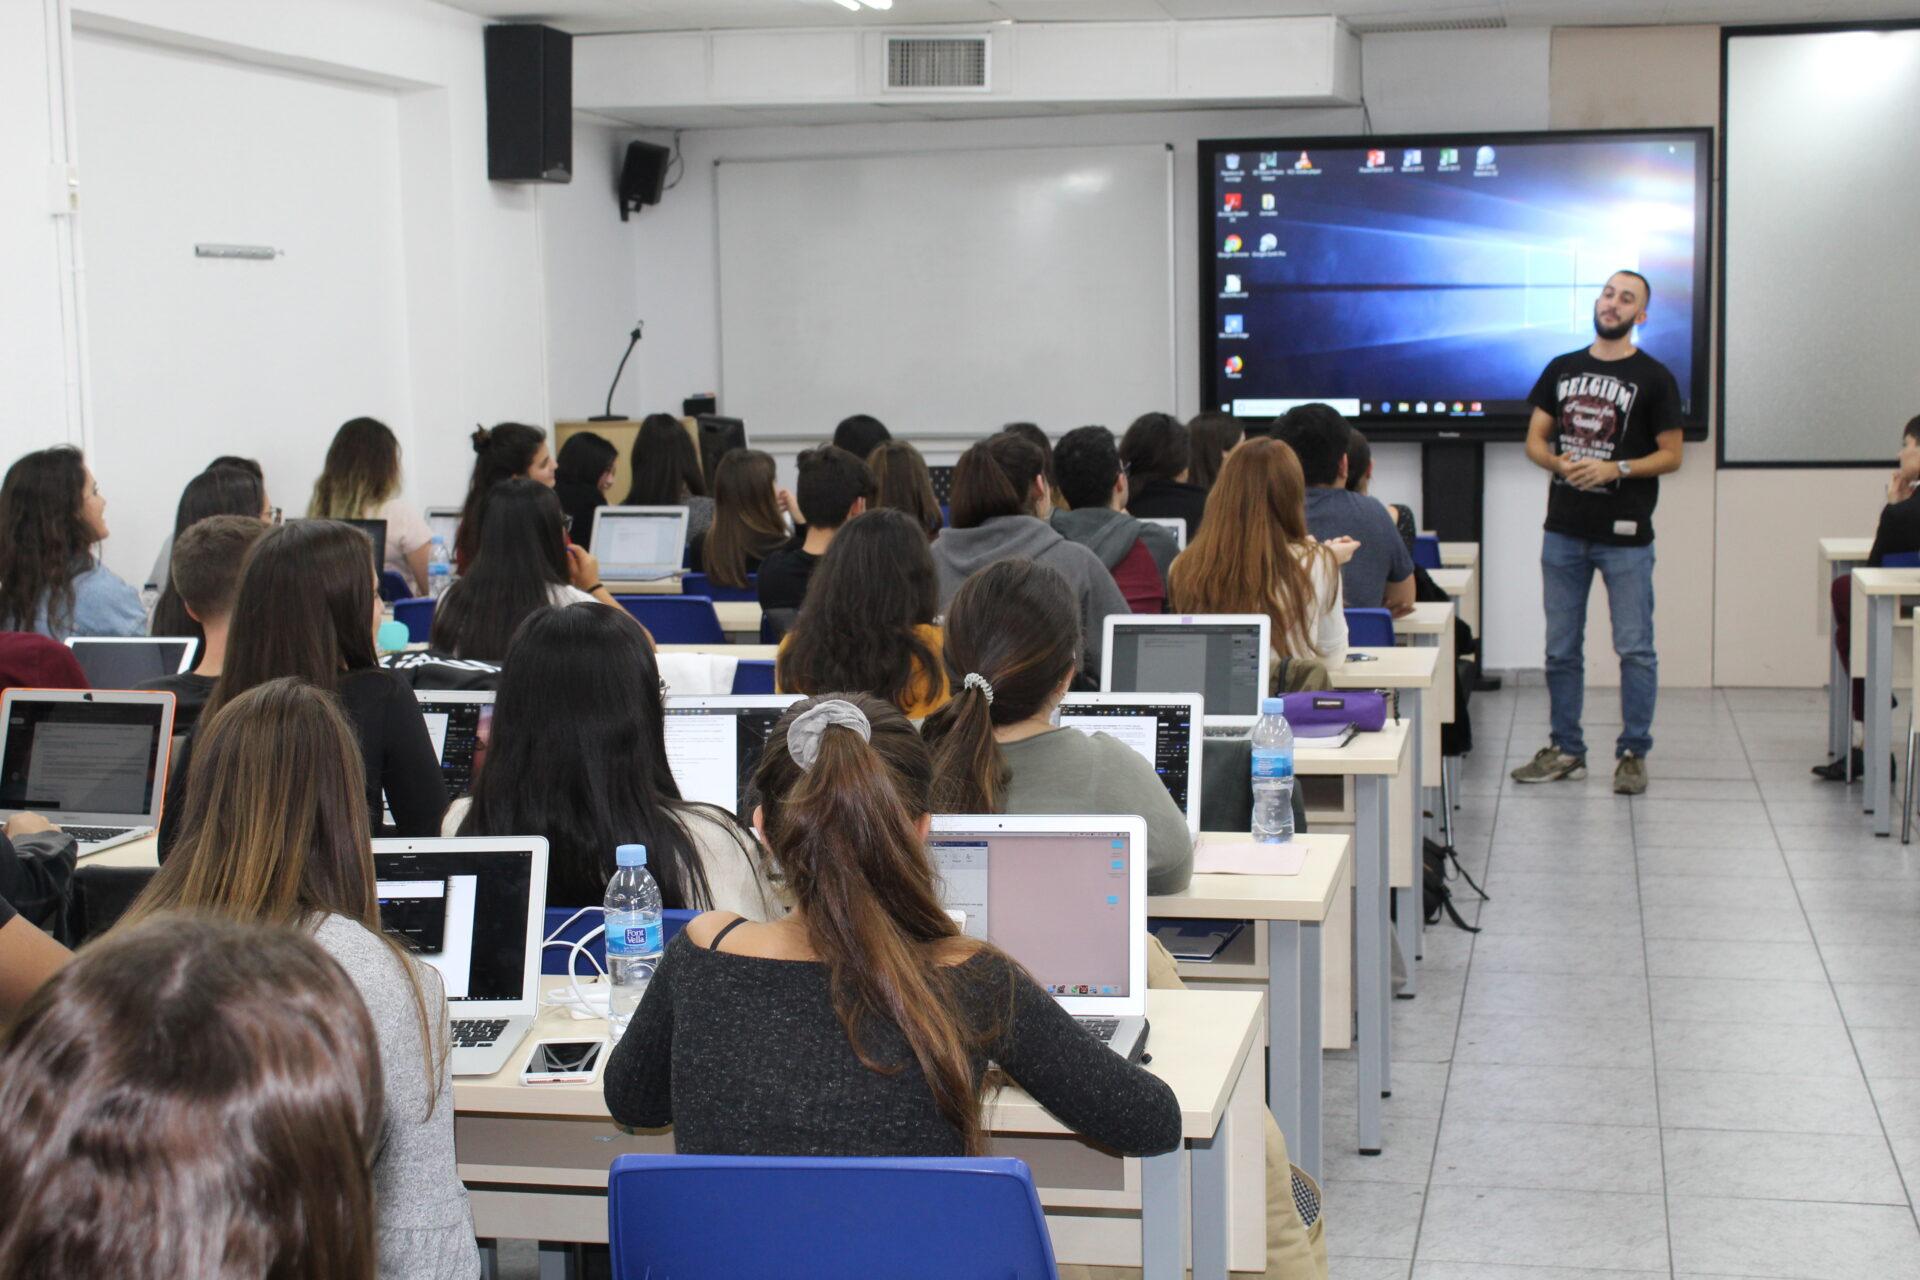 Charla Motivacional en escola universitaria mediterrani Lucas Amat